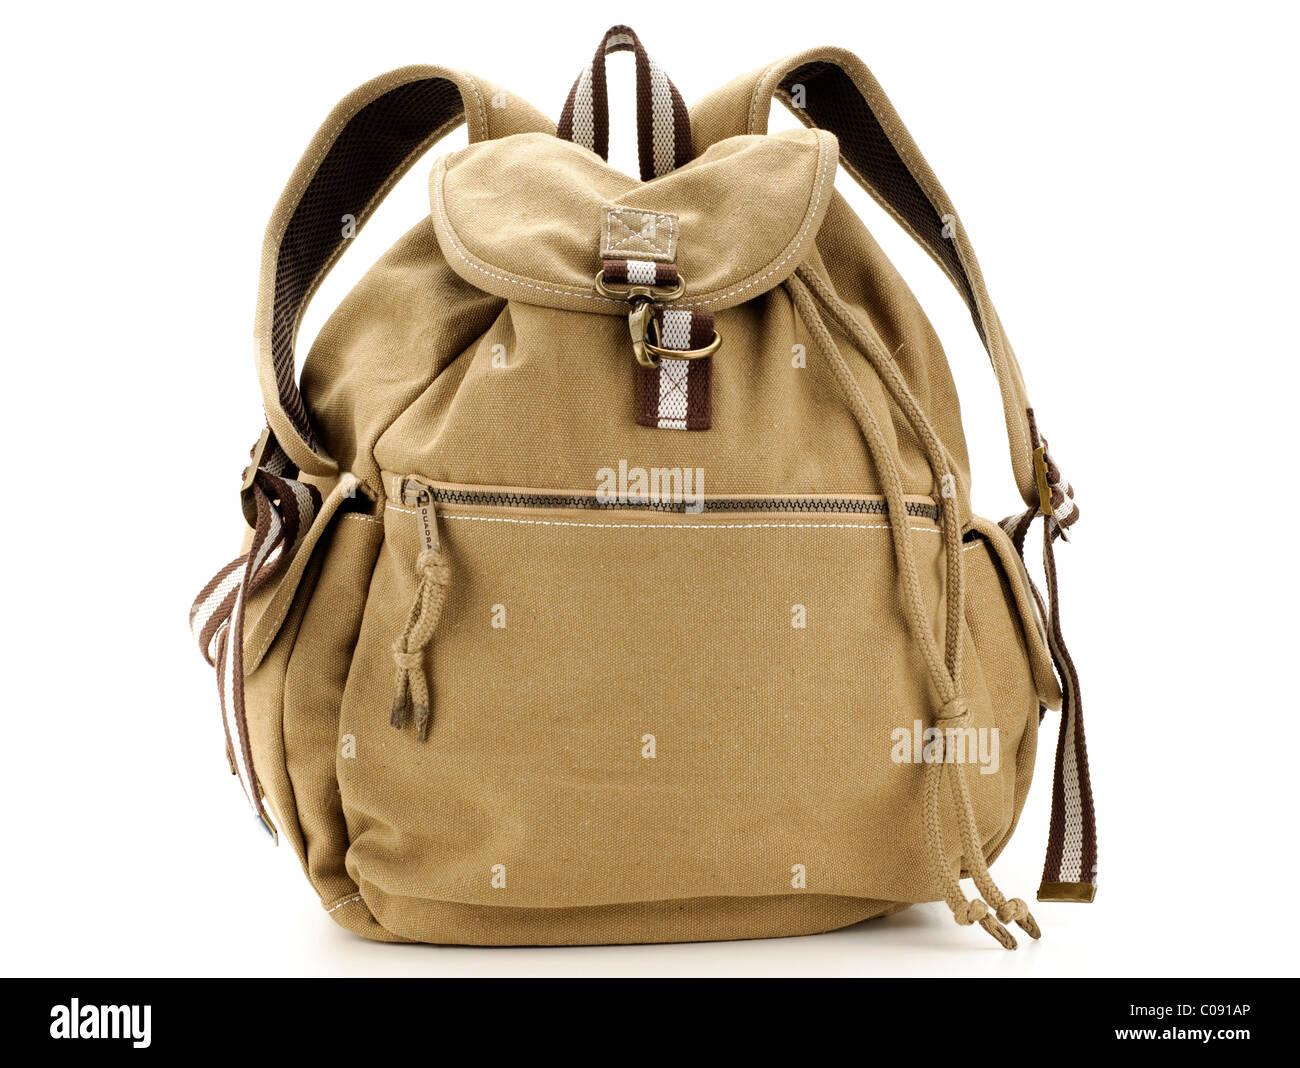 Small Quadra canvas rucksack - Stock Image